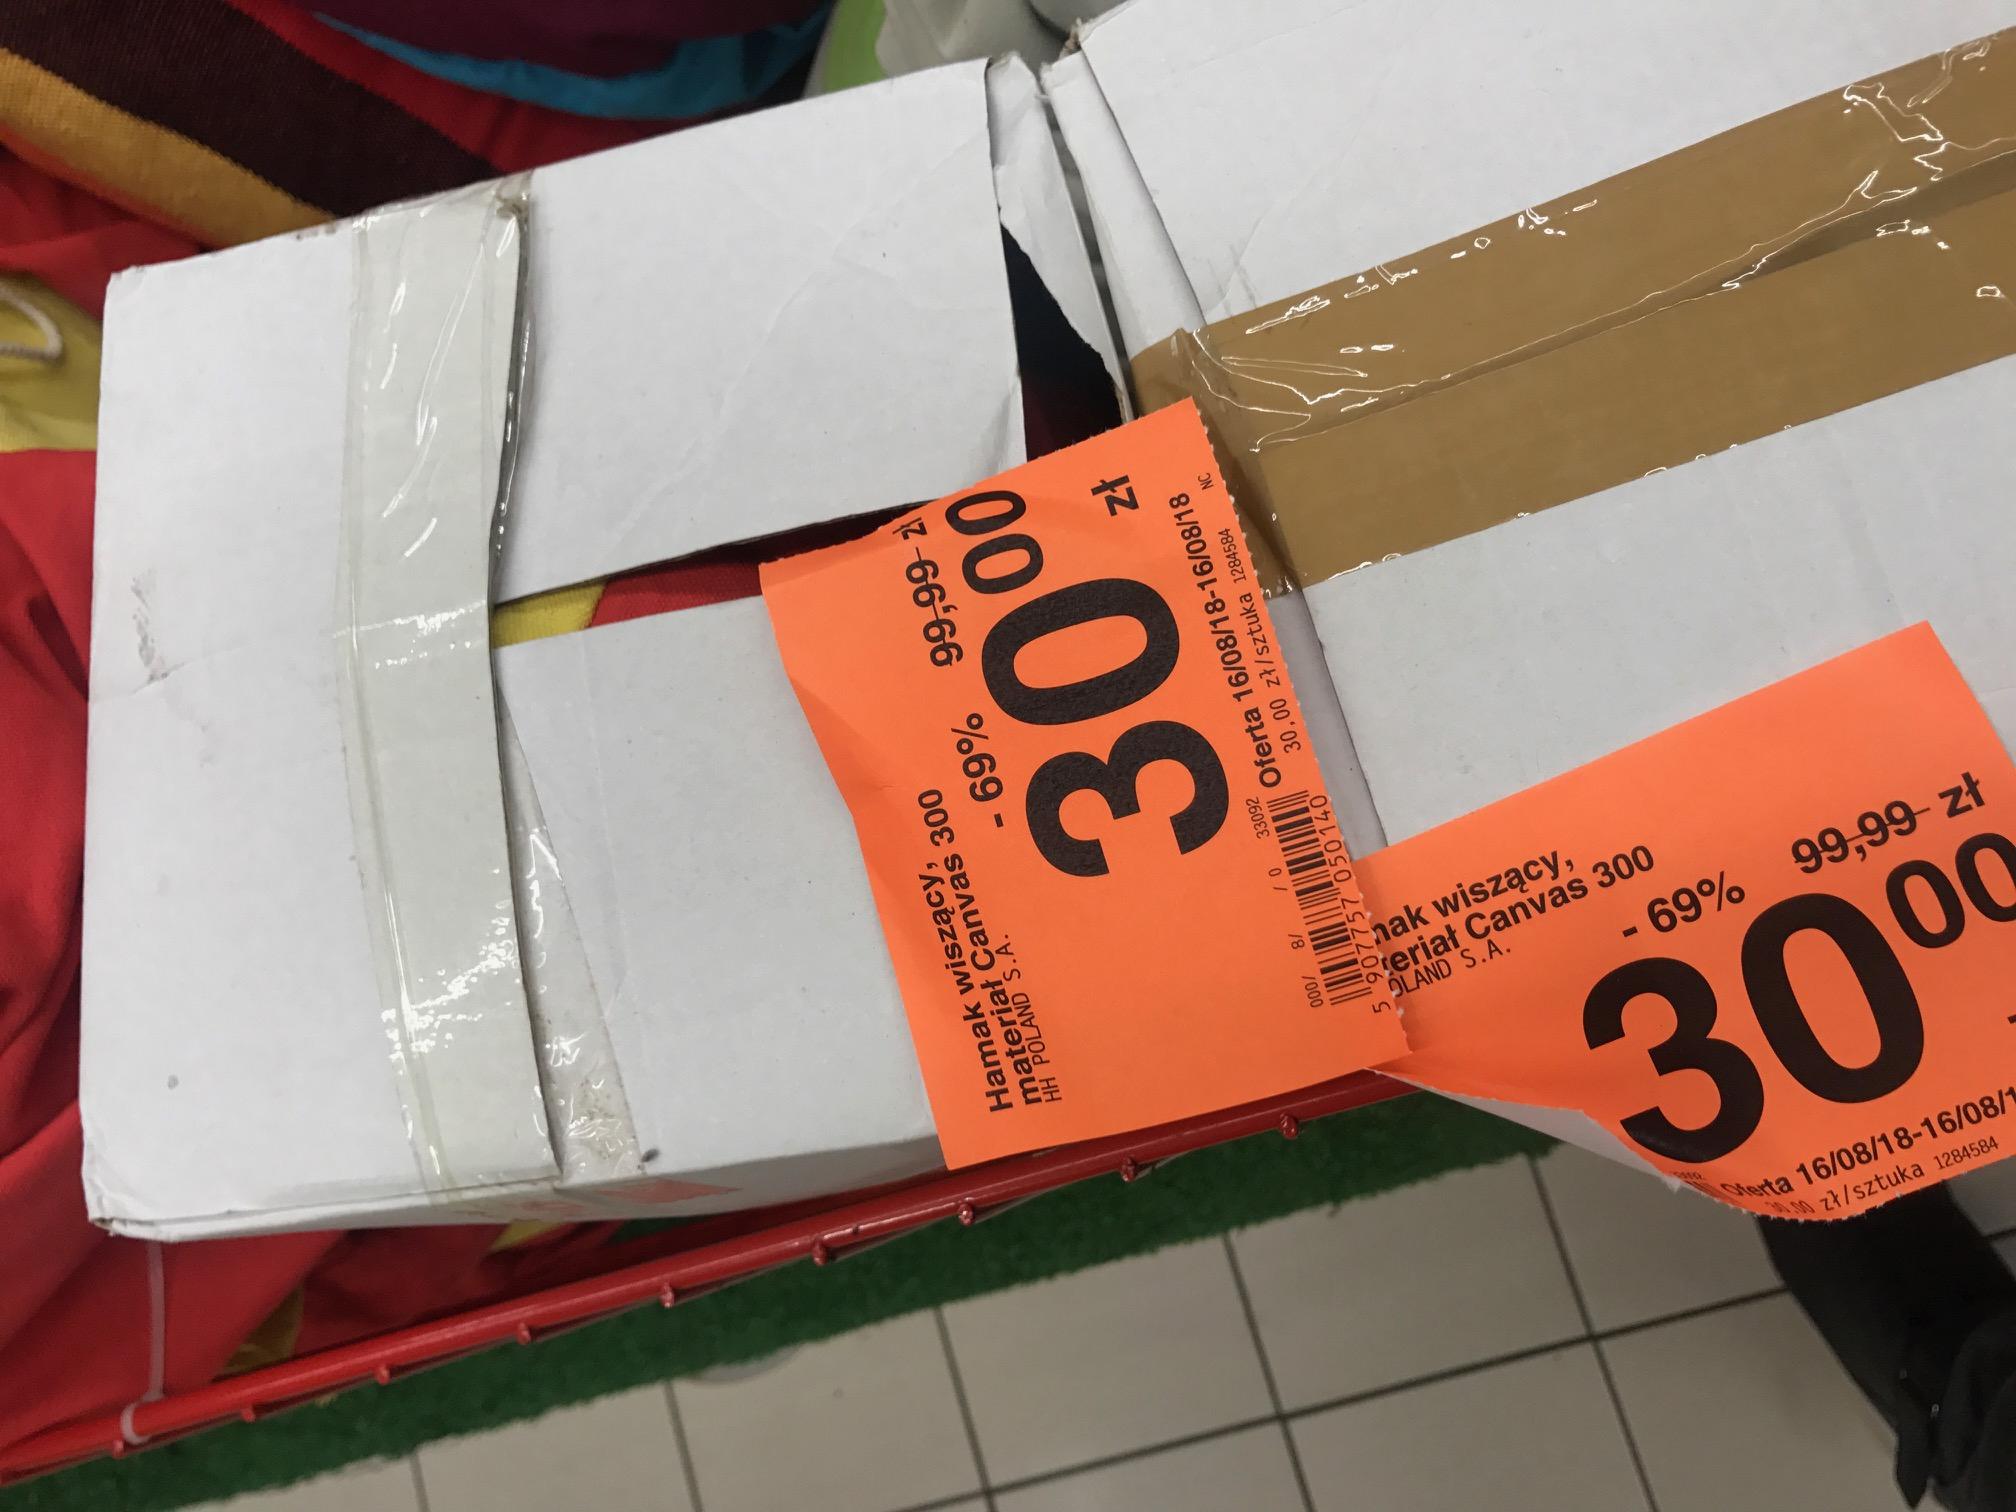 Carrefour Jaworzno Hamak Wiszacy Canvas 300.